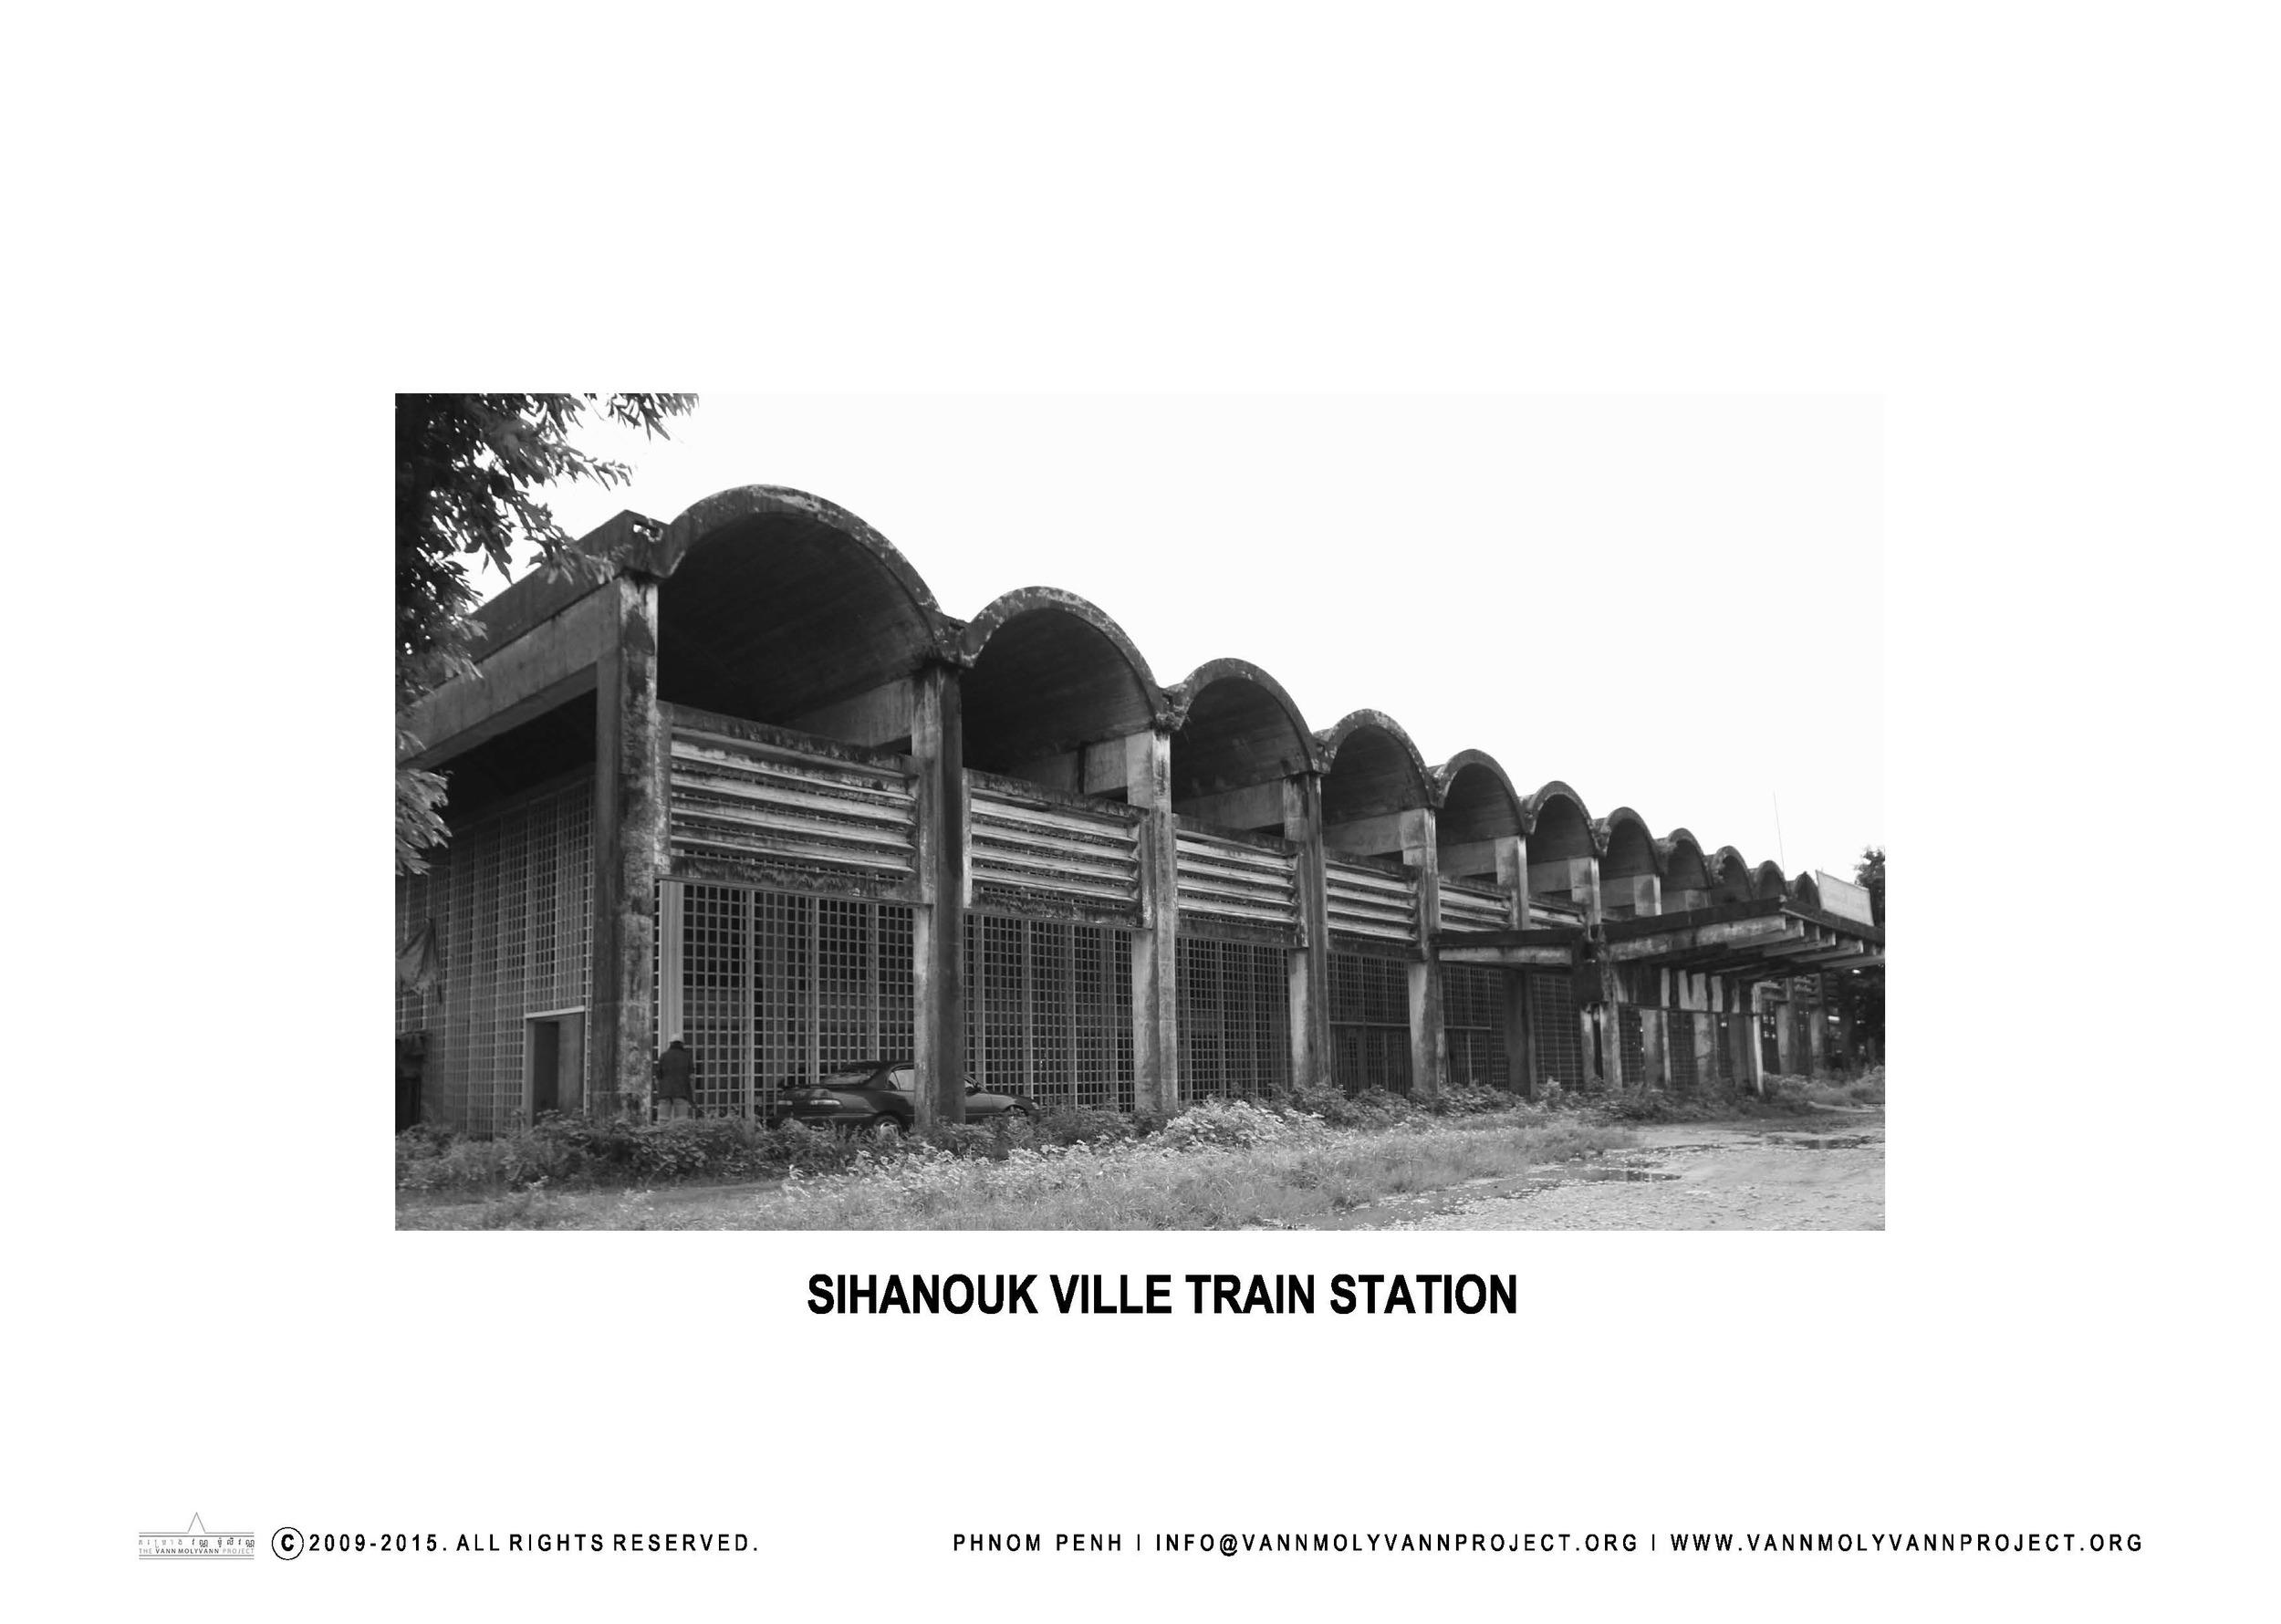 Sihanouk Ville Train Station_Page_1.jpg